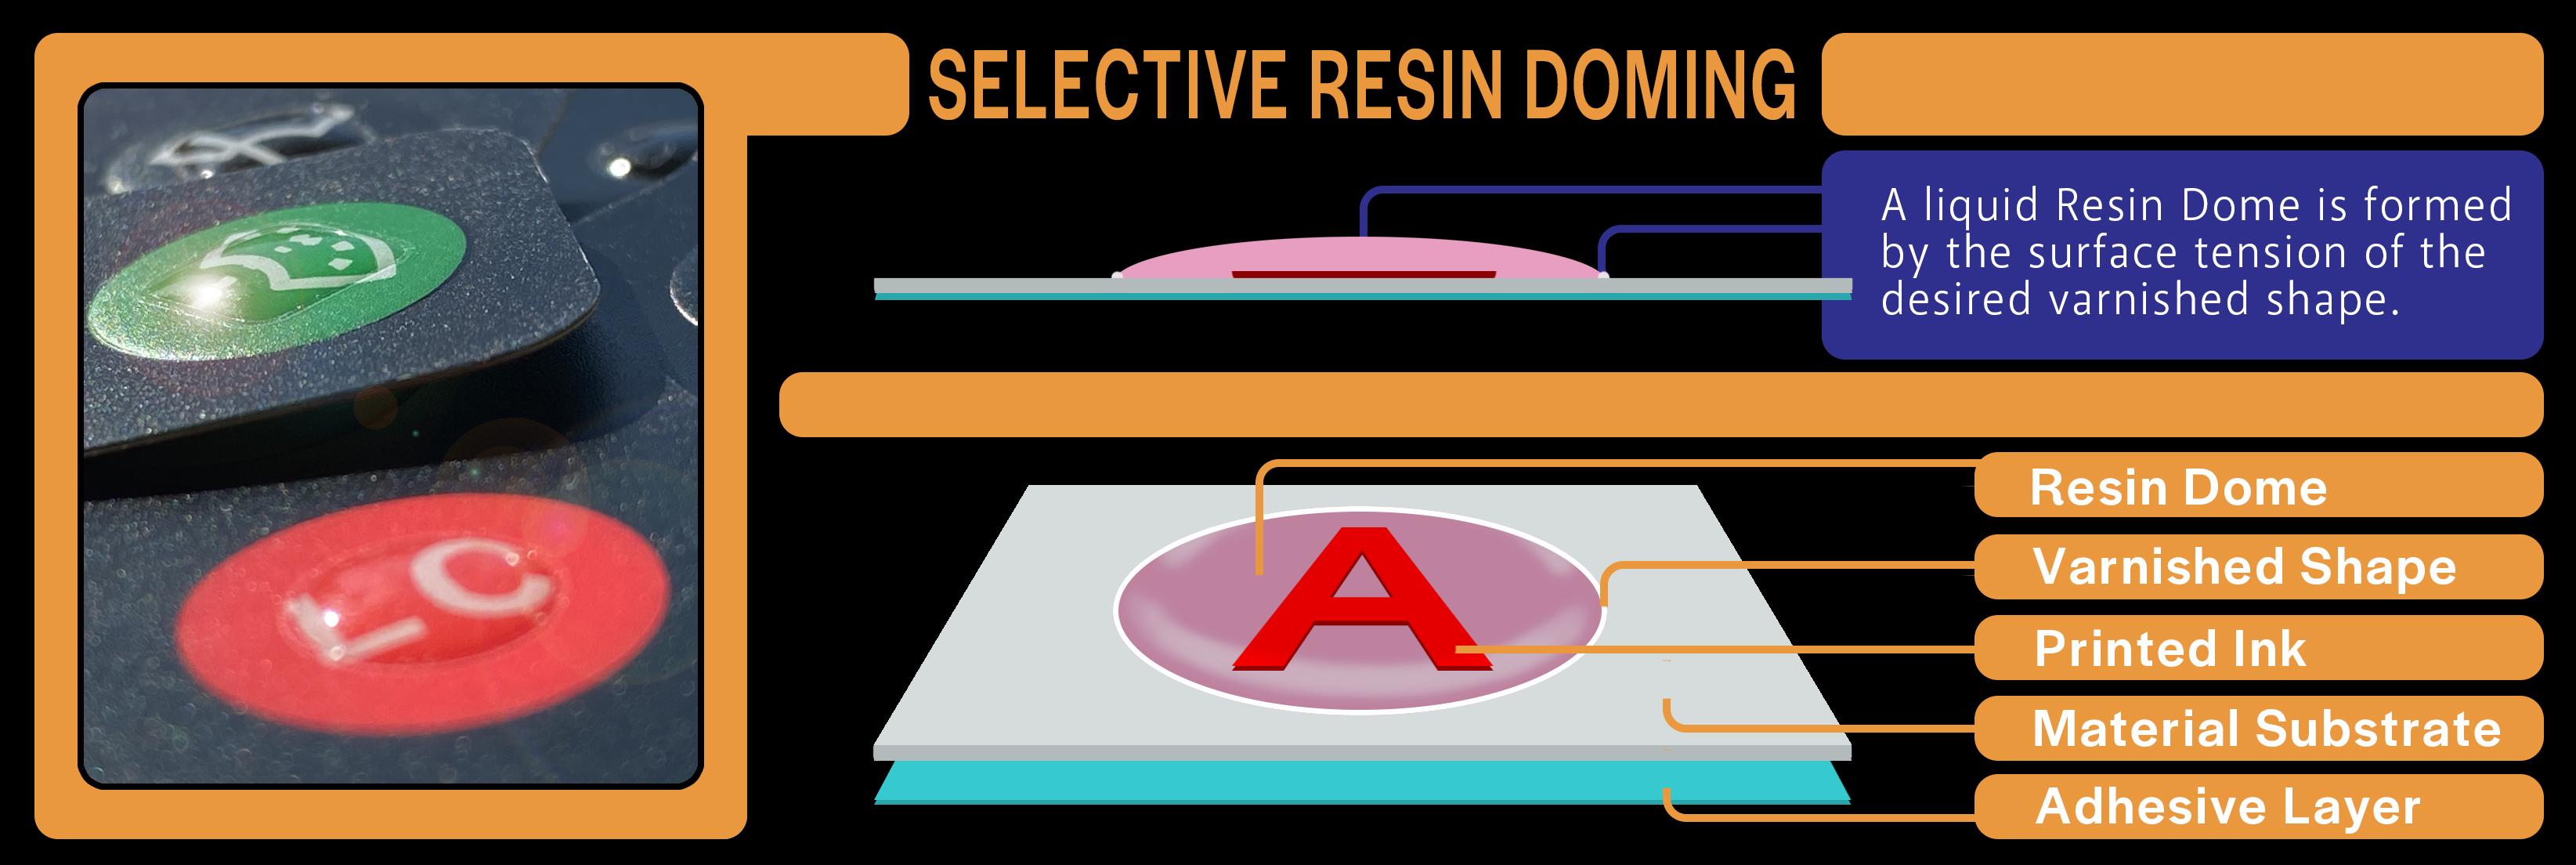 Selective Resin Doming Diagram